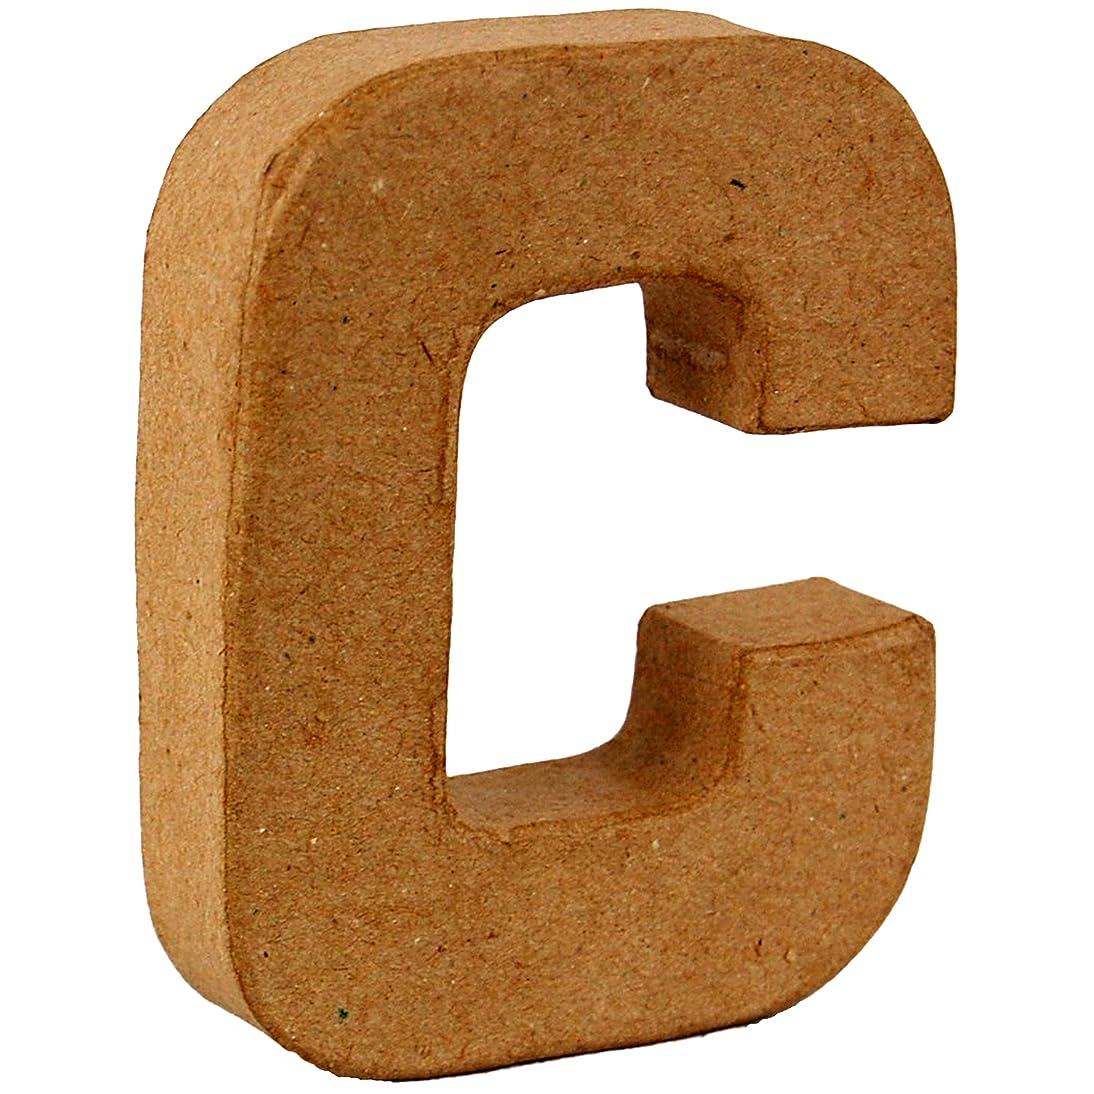 Country Love Crafts 4-inch/ 10cm 3D Letter C Papier Mache by Country Love Crafts Papier Mache